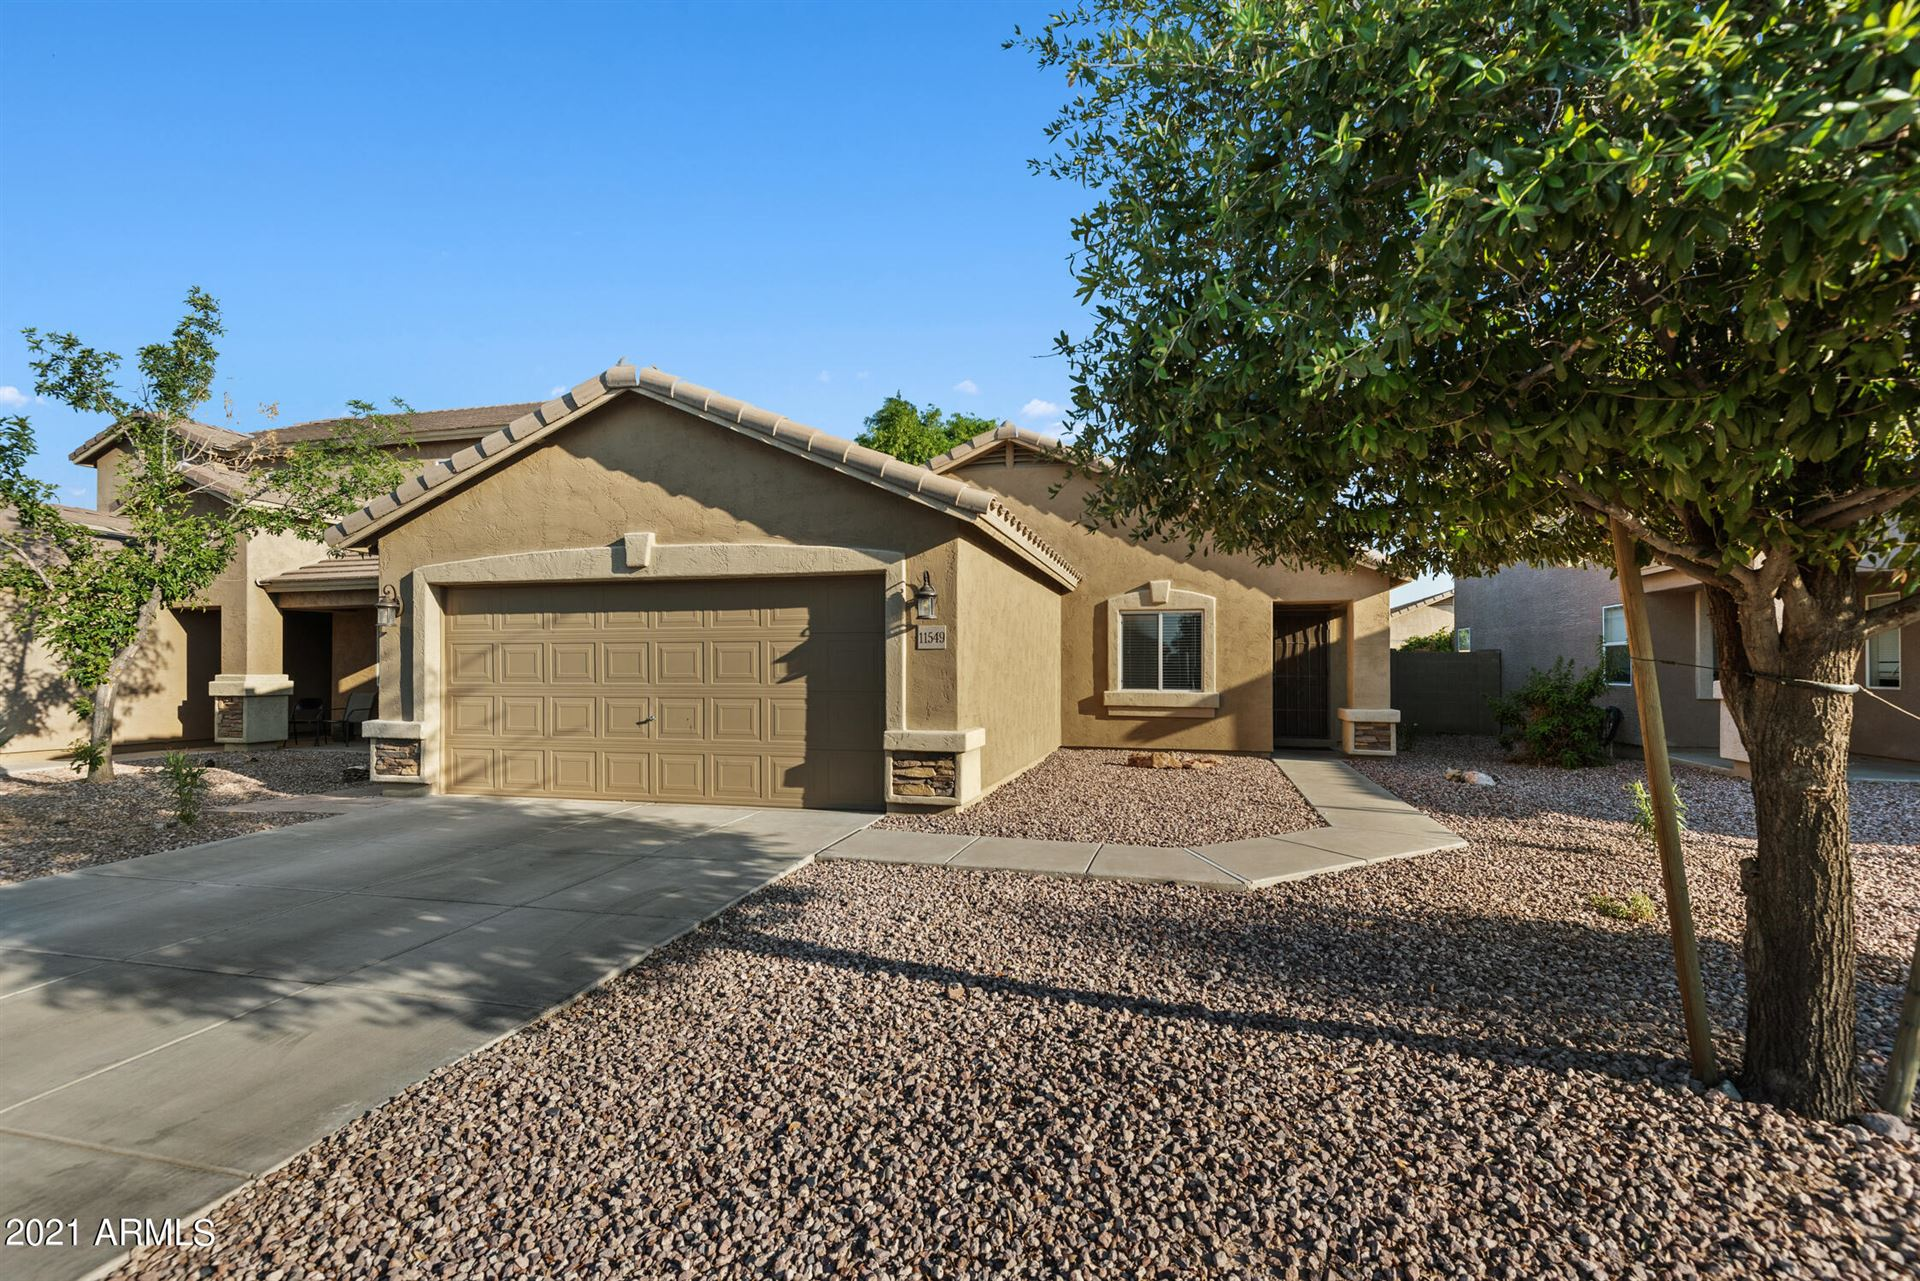 Photo of 11549 W OGLESBY Avenue, Youngtown, AZ 85363 (MLS # 6261160)